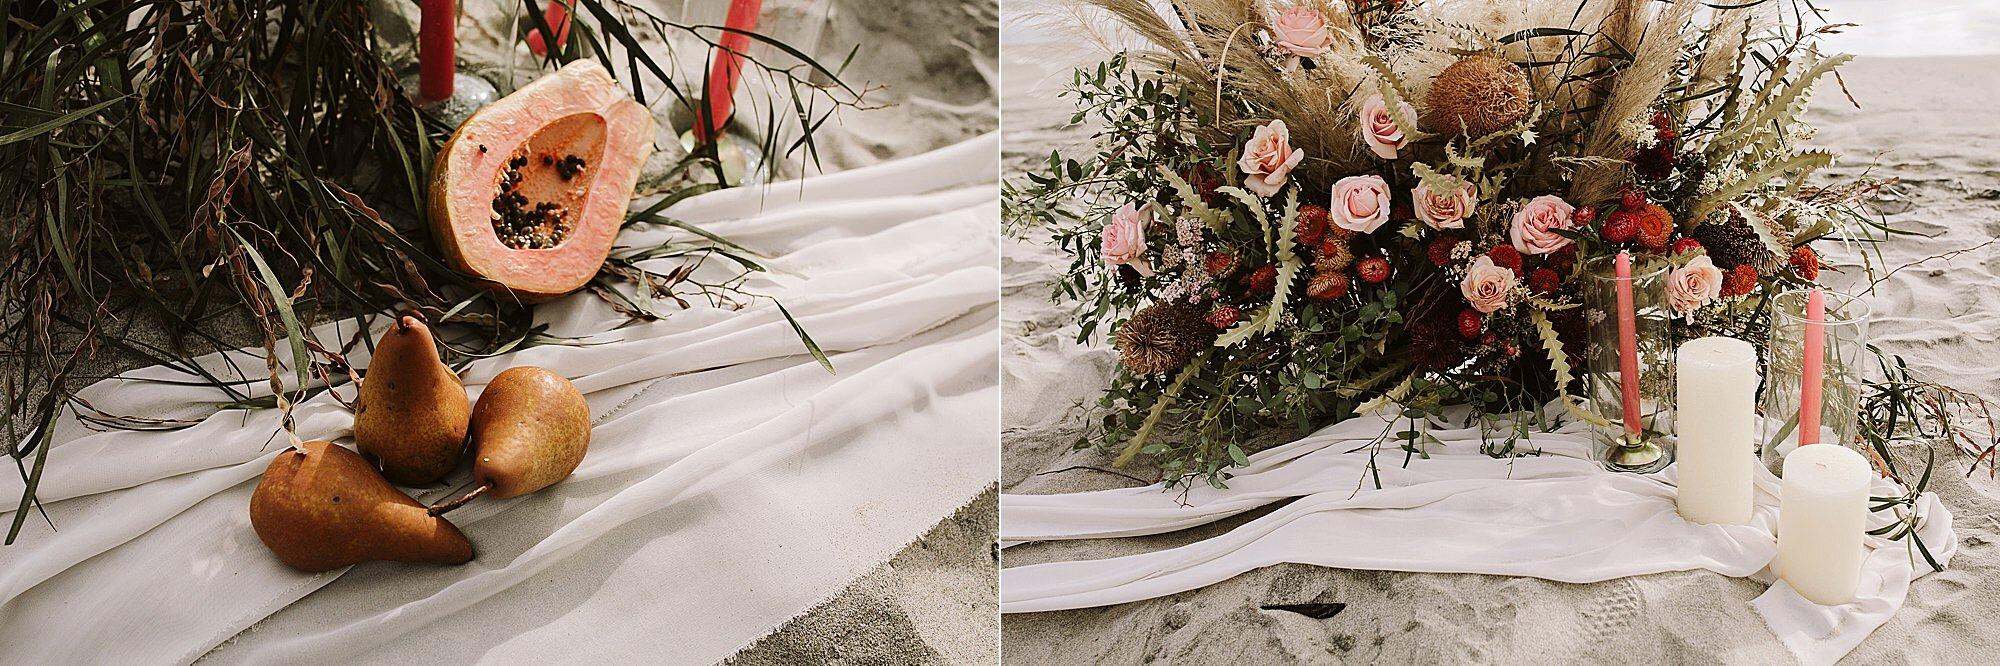 ELOPING_IN_CALIFORNIA_ALFONSO_FLORES_DESTINATION_WEDDING_PHOTOGRAPHY-26.jpg